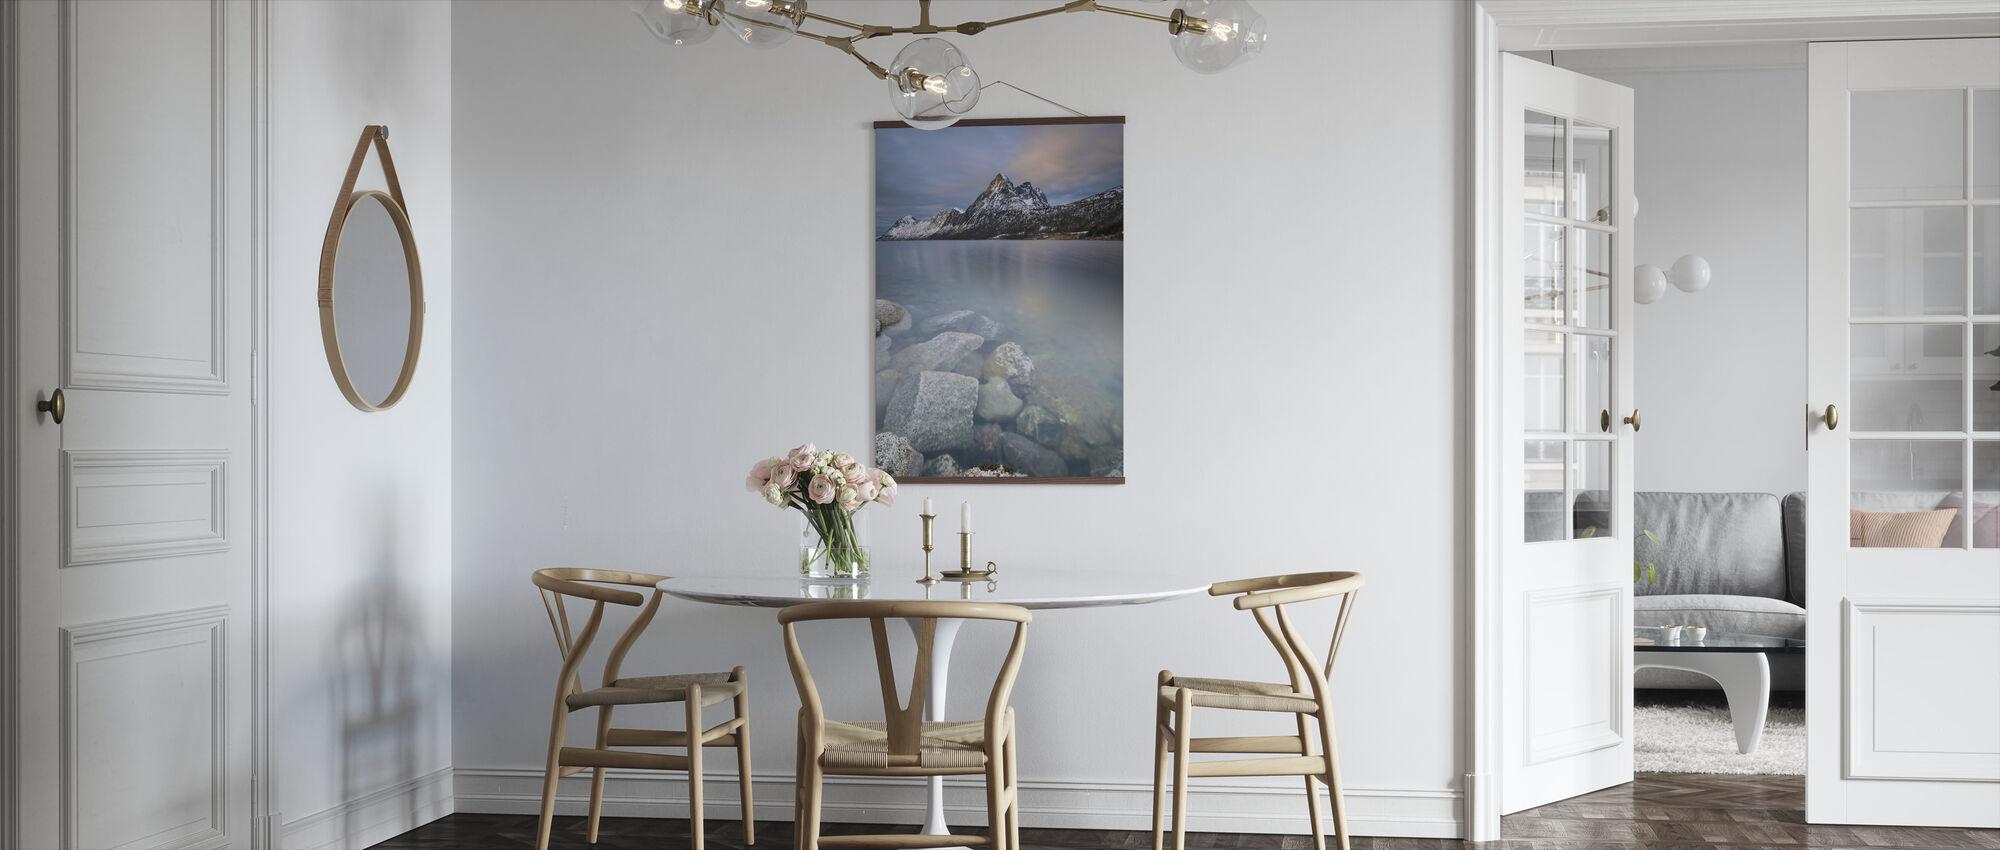 Senja-eiland - Poster - Keuken